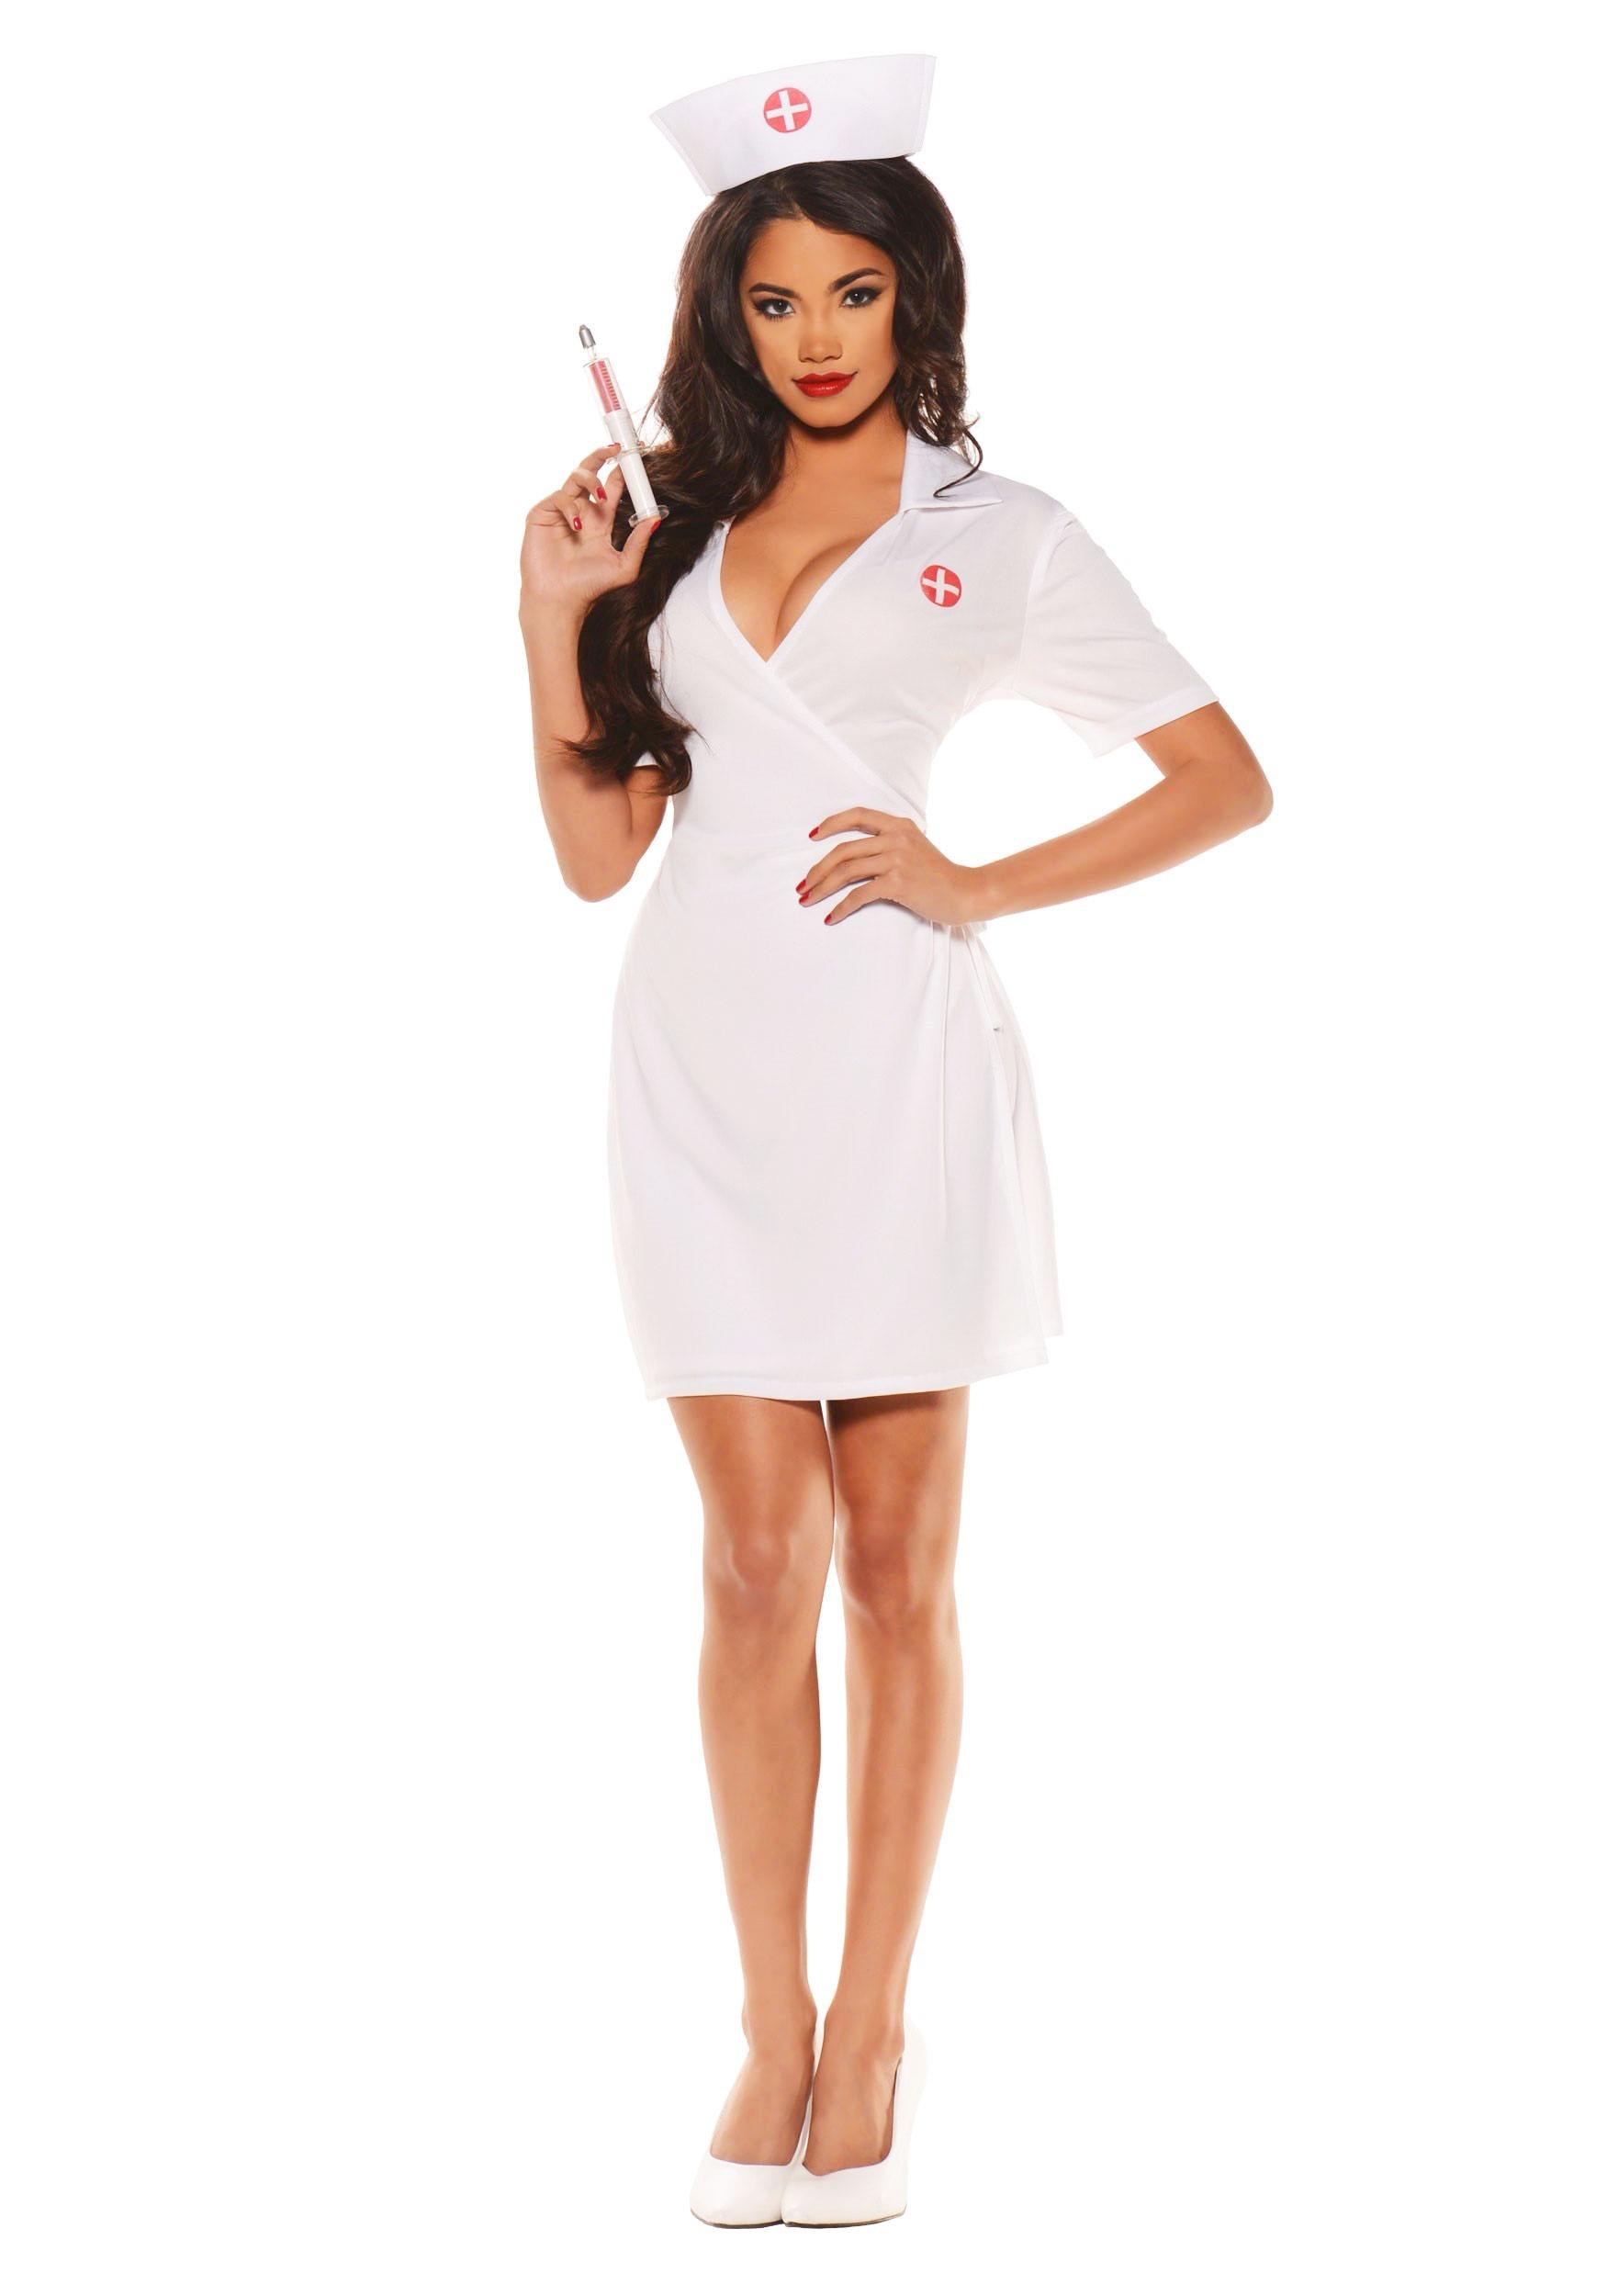 Sweet Placebo Nurse Costume   Nurse costume, Costumes for